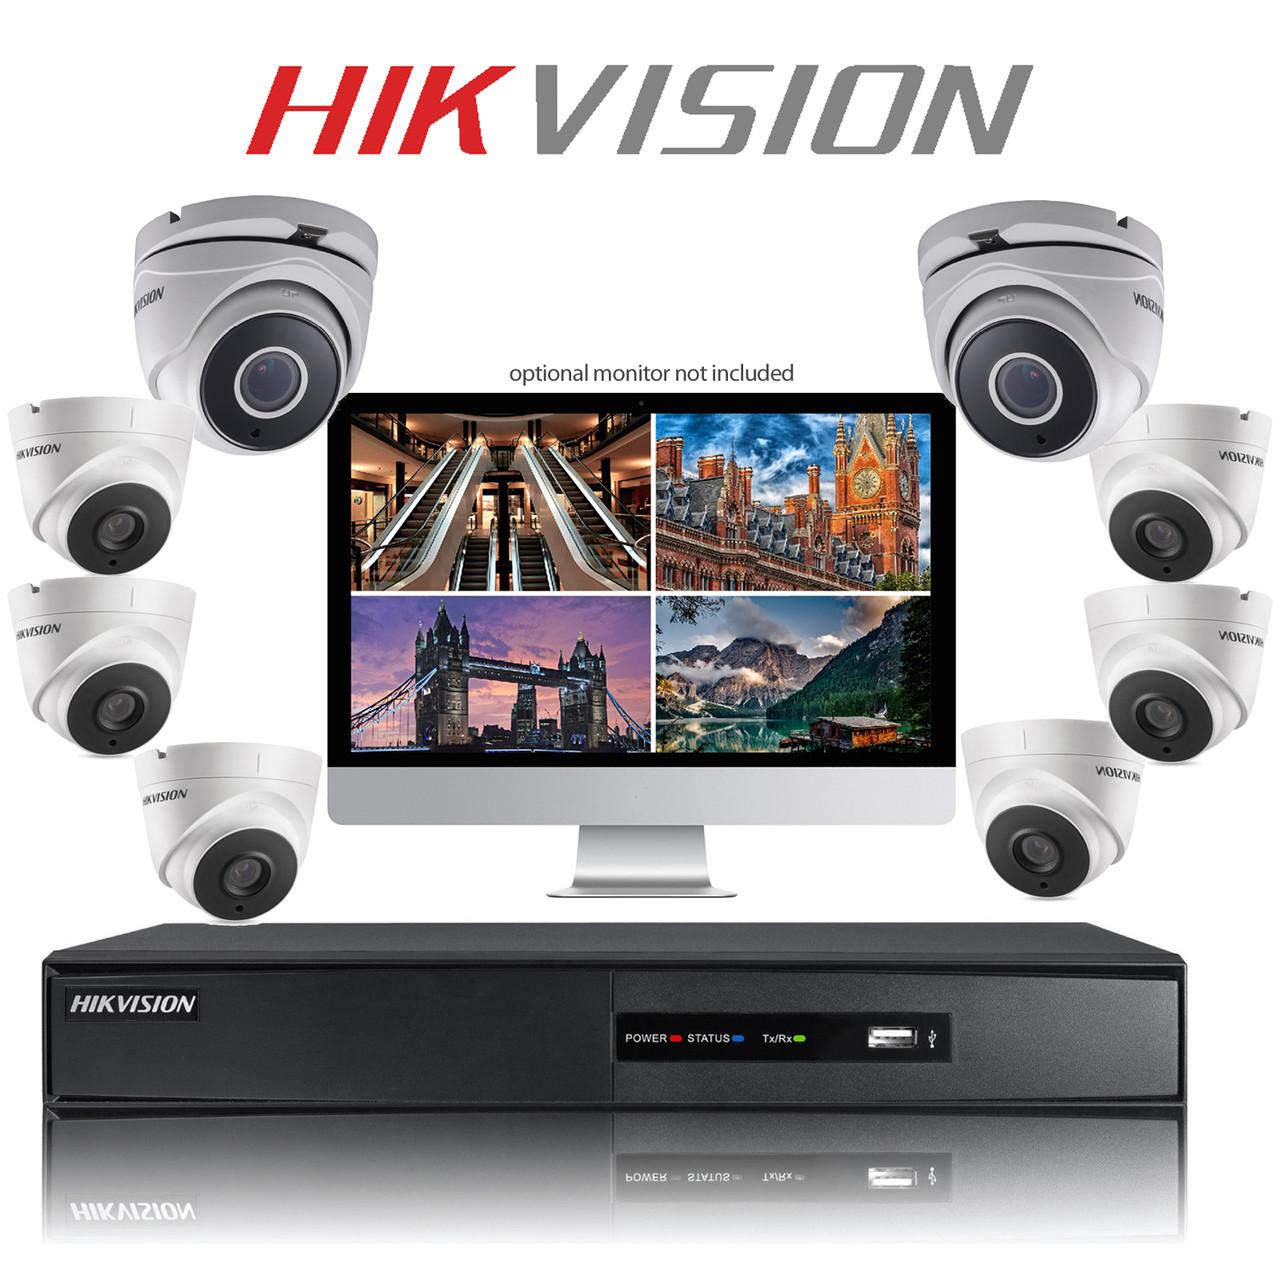 8 Hikvision DIY TurboHD CCTV Dome camera kit with DVR